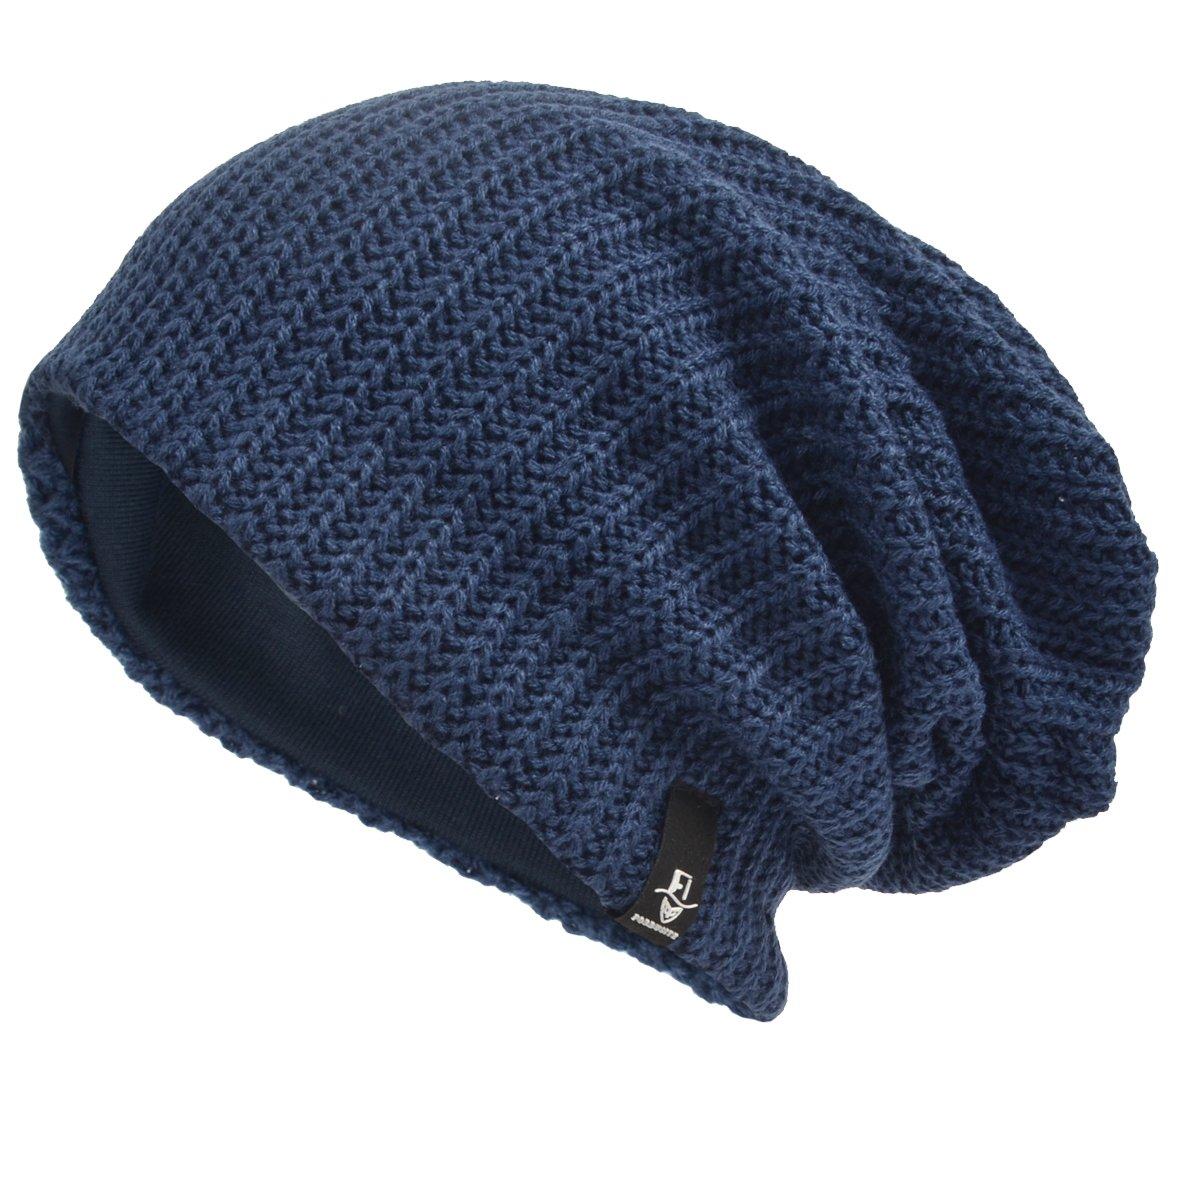 VECRY Men's Cool Cotton Beanie Slouch Skull Cap Long Baggy Hip-hop Winter Summer Hat B305 S-B305-Black-R